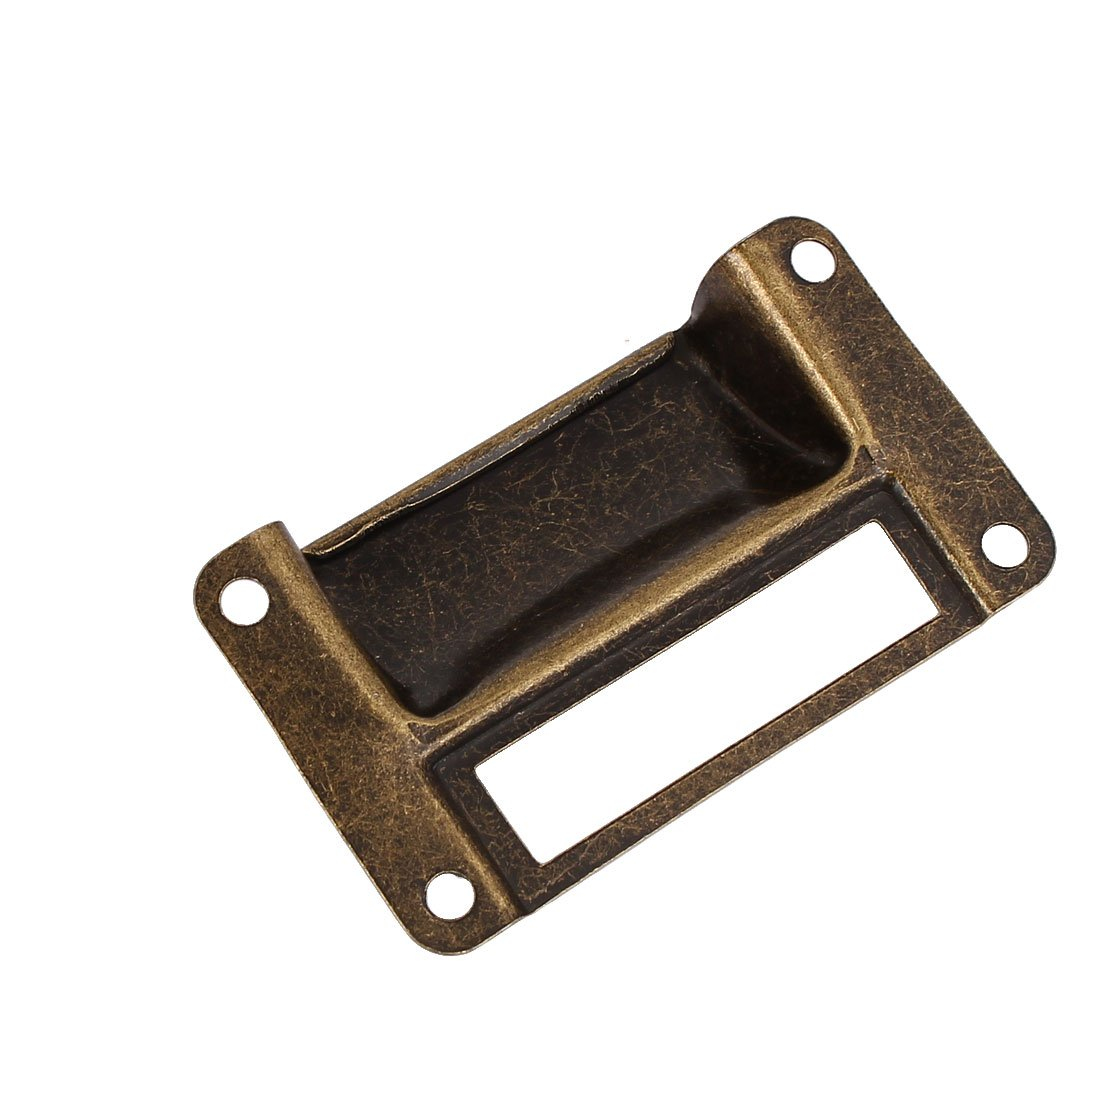 uxcell a16062000ux0466/Label Halterung Pull Bibliothek Post Office Datei Schublade zieht Label Halter Bronze Tone 100 de